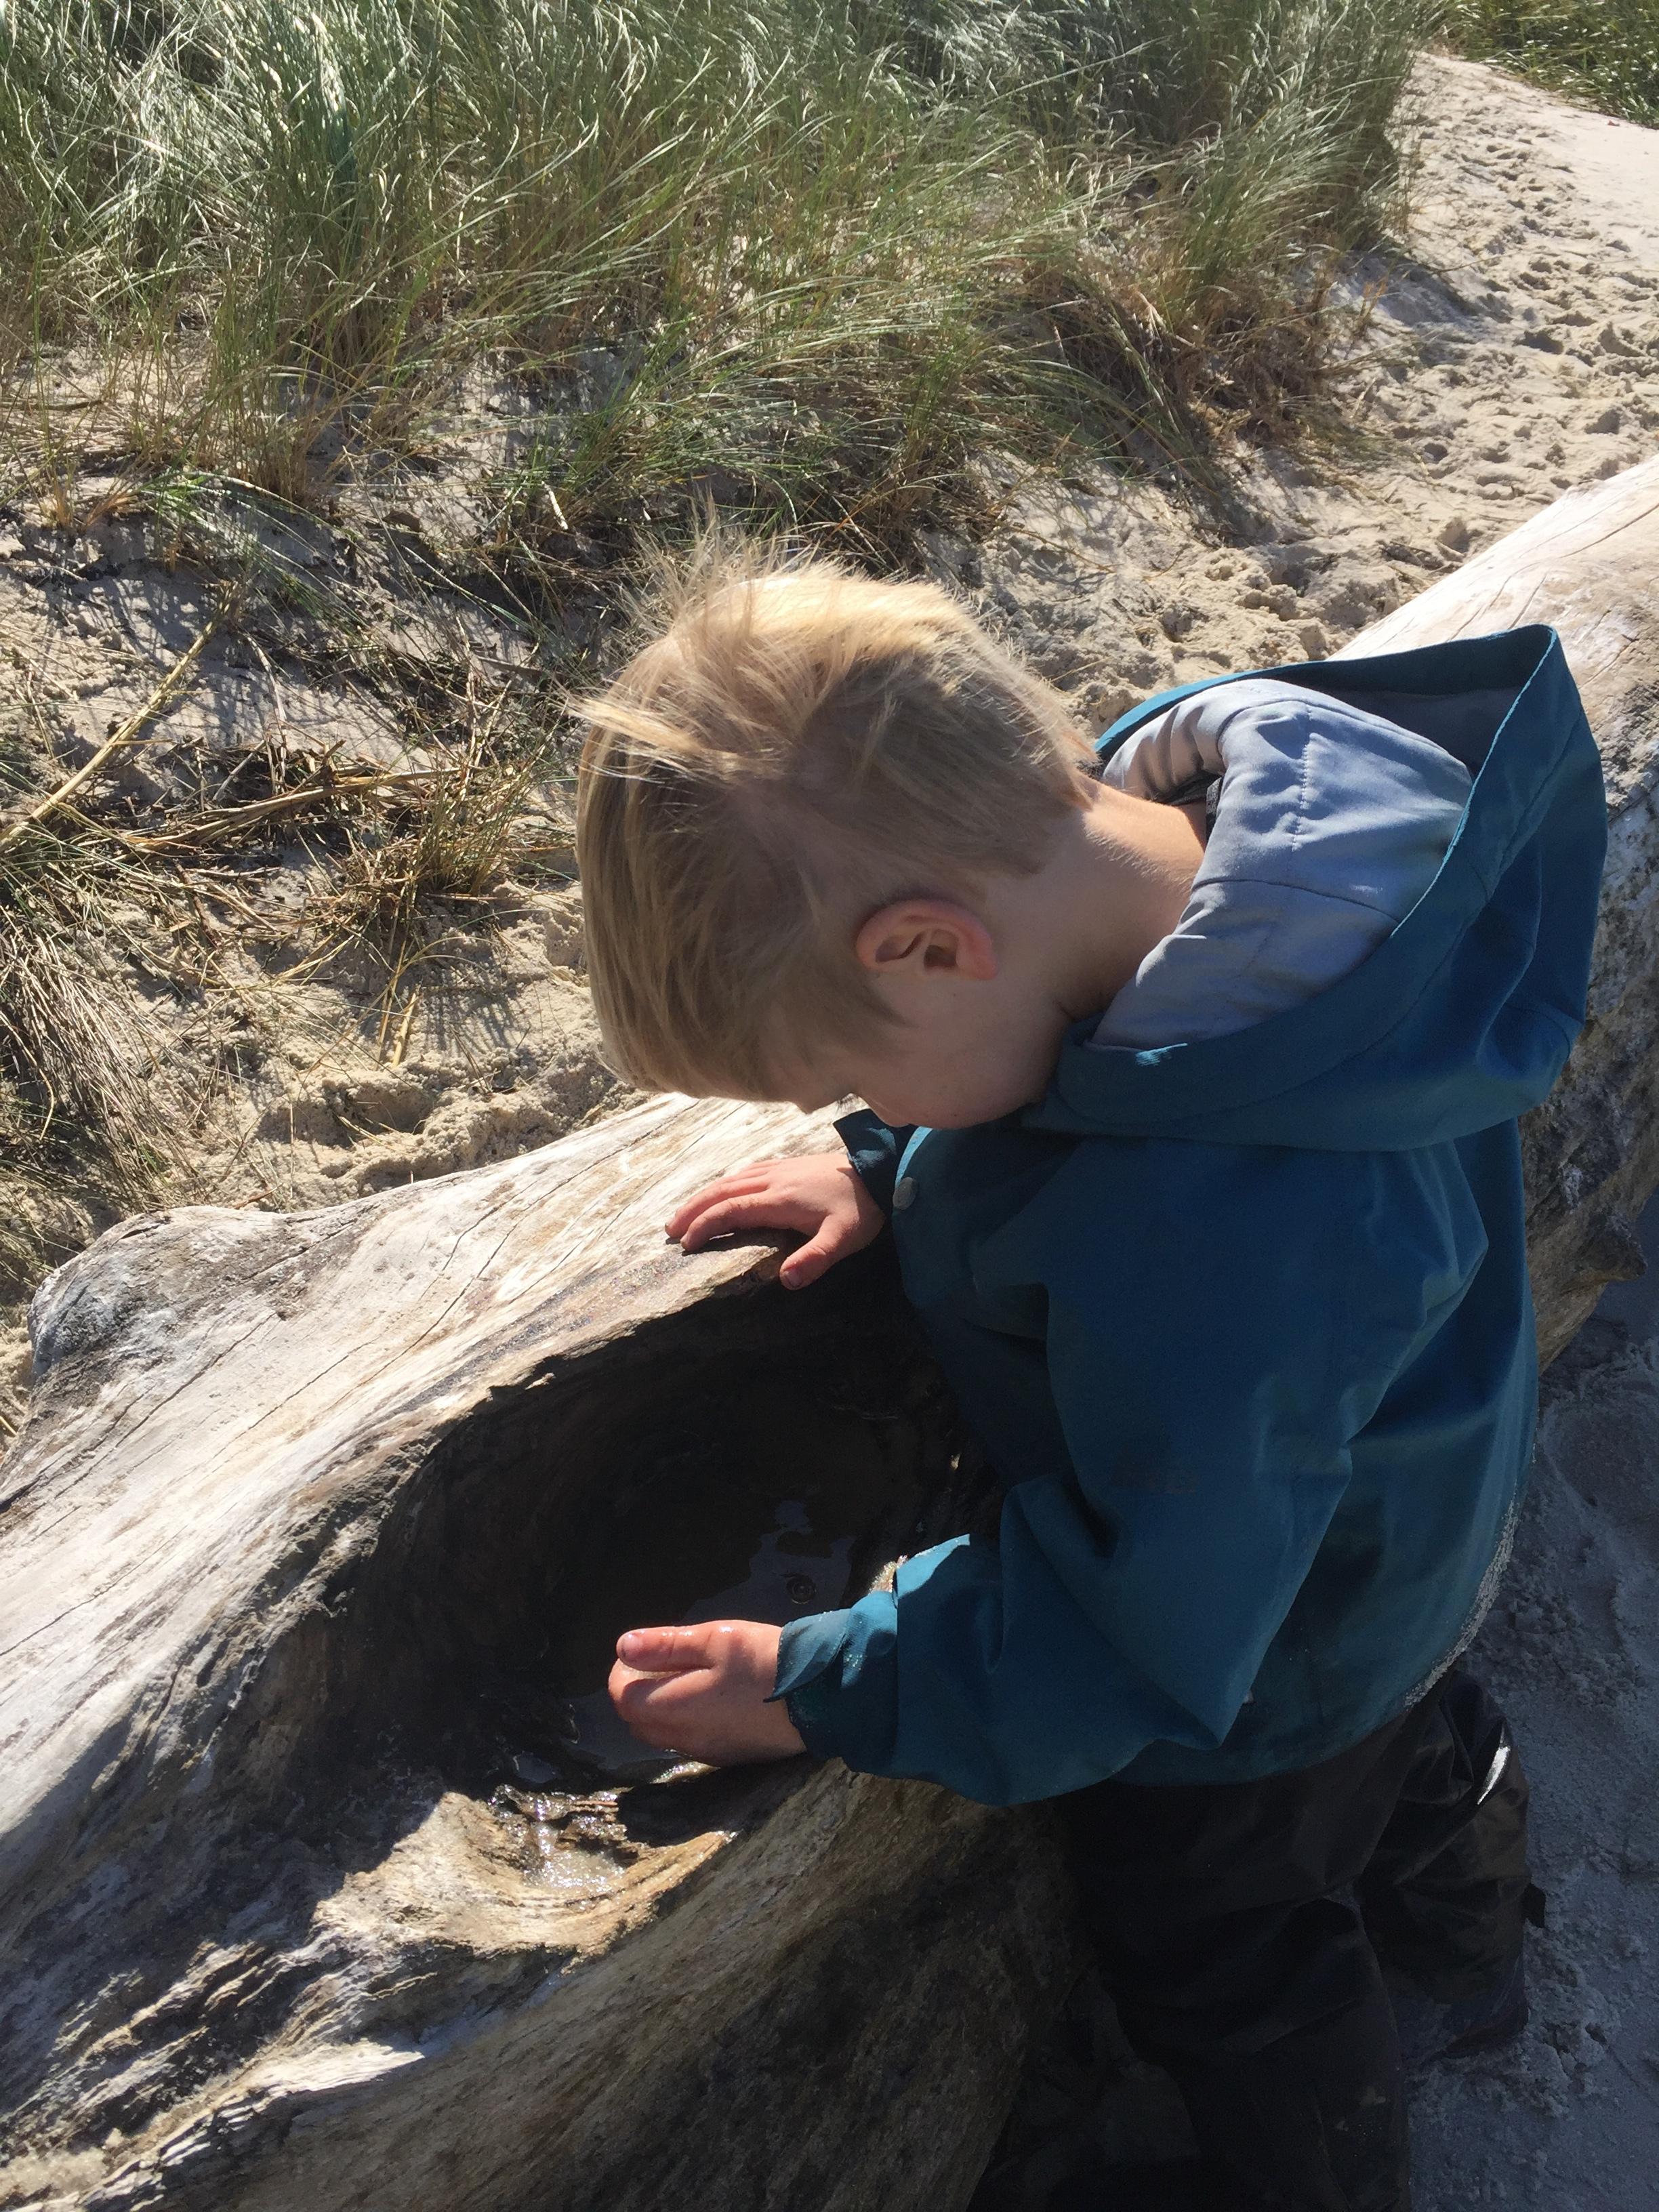 Exploring a tide pool in a log.